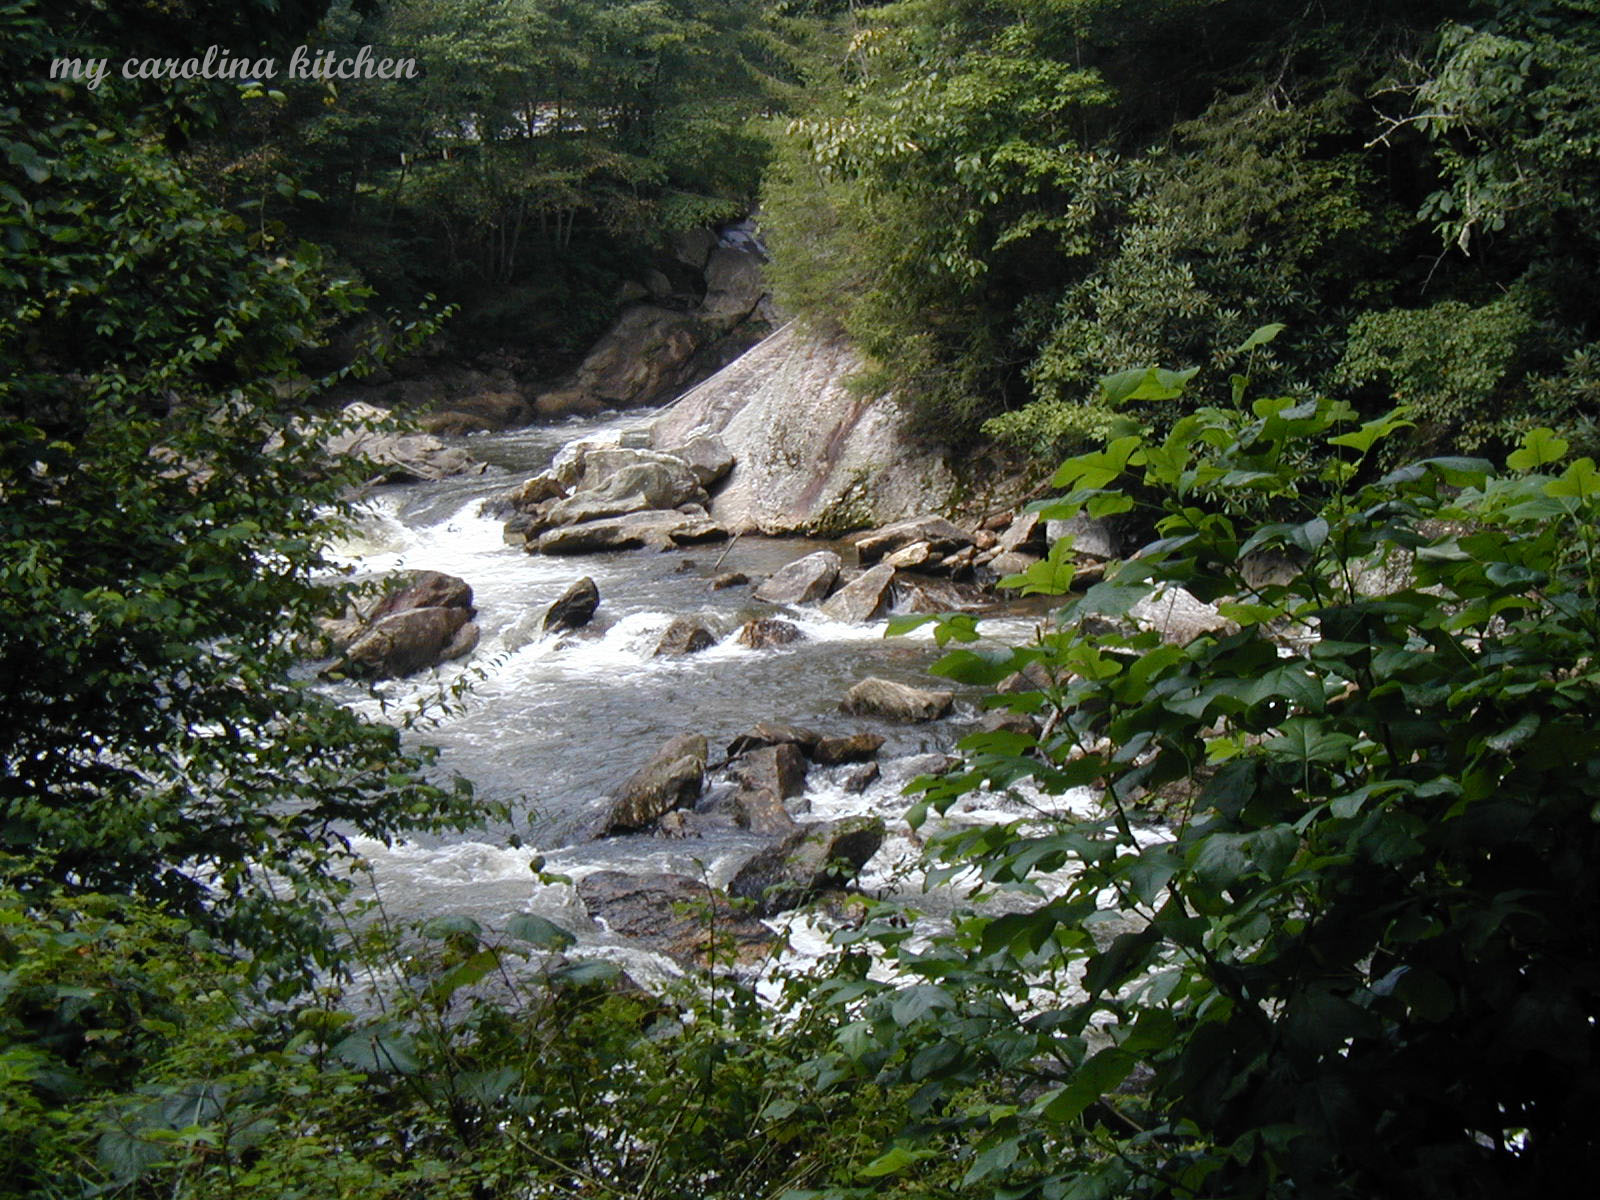 My Carolina Kitchen Highlands North Carolina High In The Mountains Where Cool Mountain Air